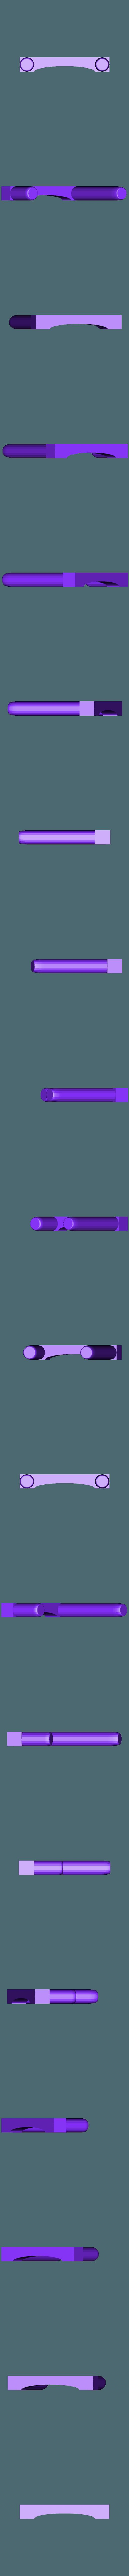 BikeRack50mmLatch.stl Download free STL file Bike Wall Holder • Design to 3D print, Hardcore3D